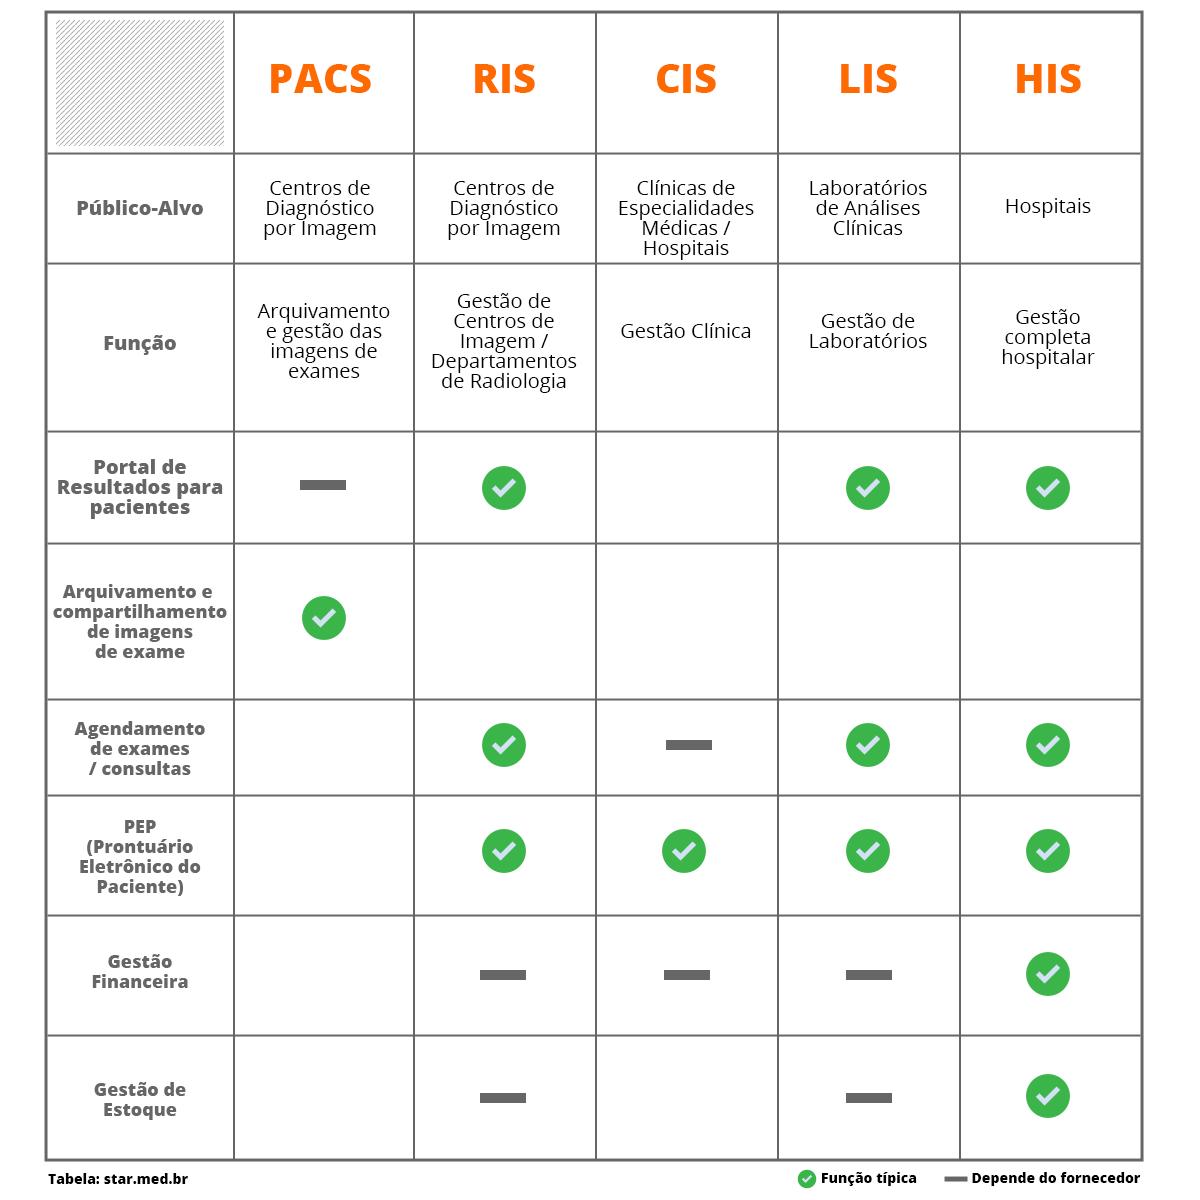 Tabela Comparativa Pacs Ris Sis Lis His